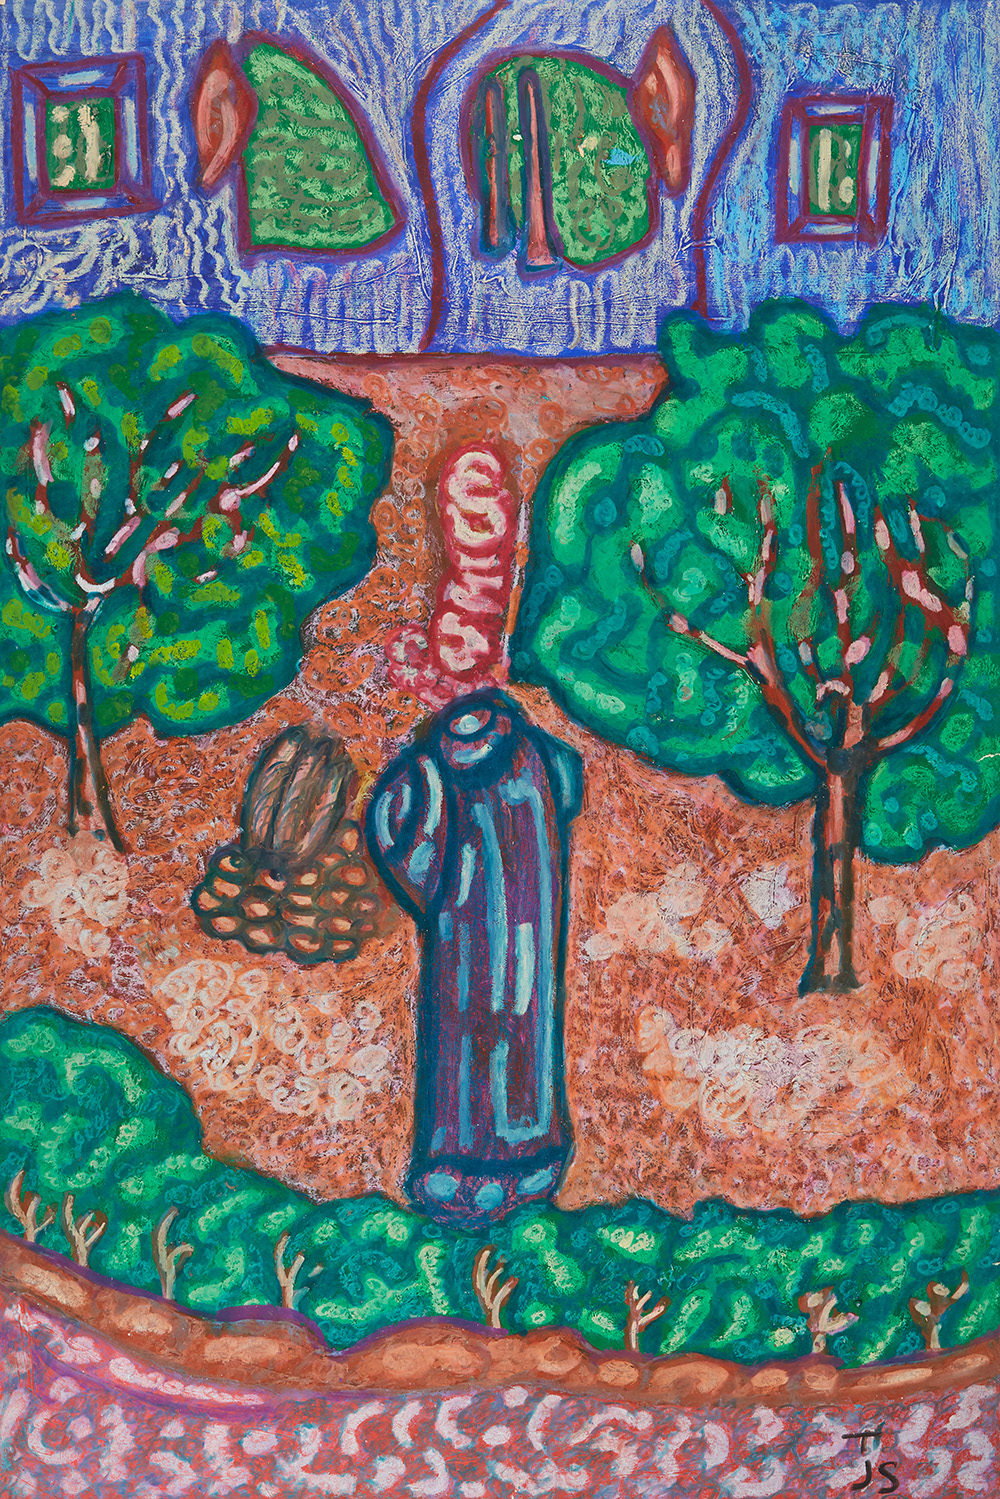 Anthony Joseph Salvatore  Psalms 58, v.8  , 1989 Oil stick, acrylic, mixed media/paper 35.5 x 24 inches 90.2 x 61 cm JS 169